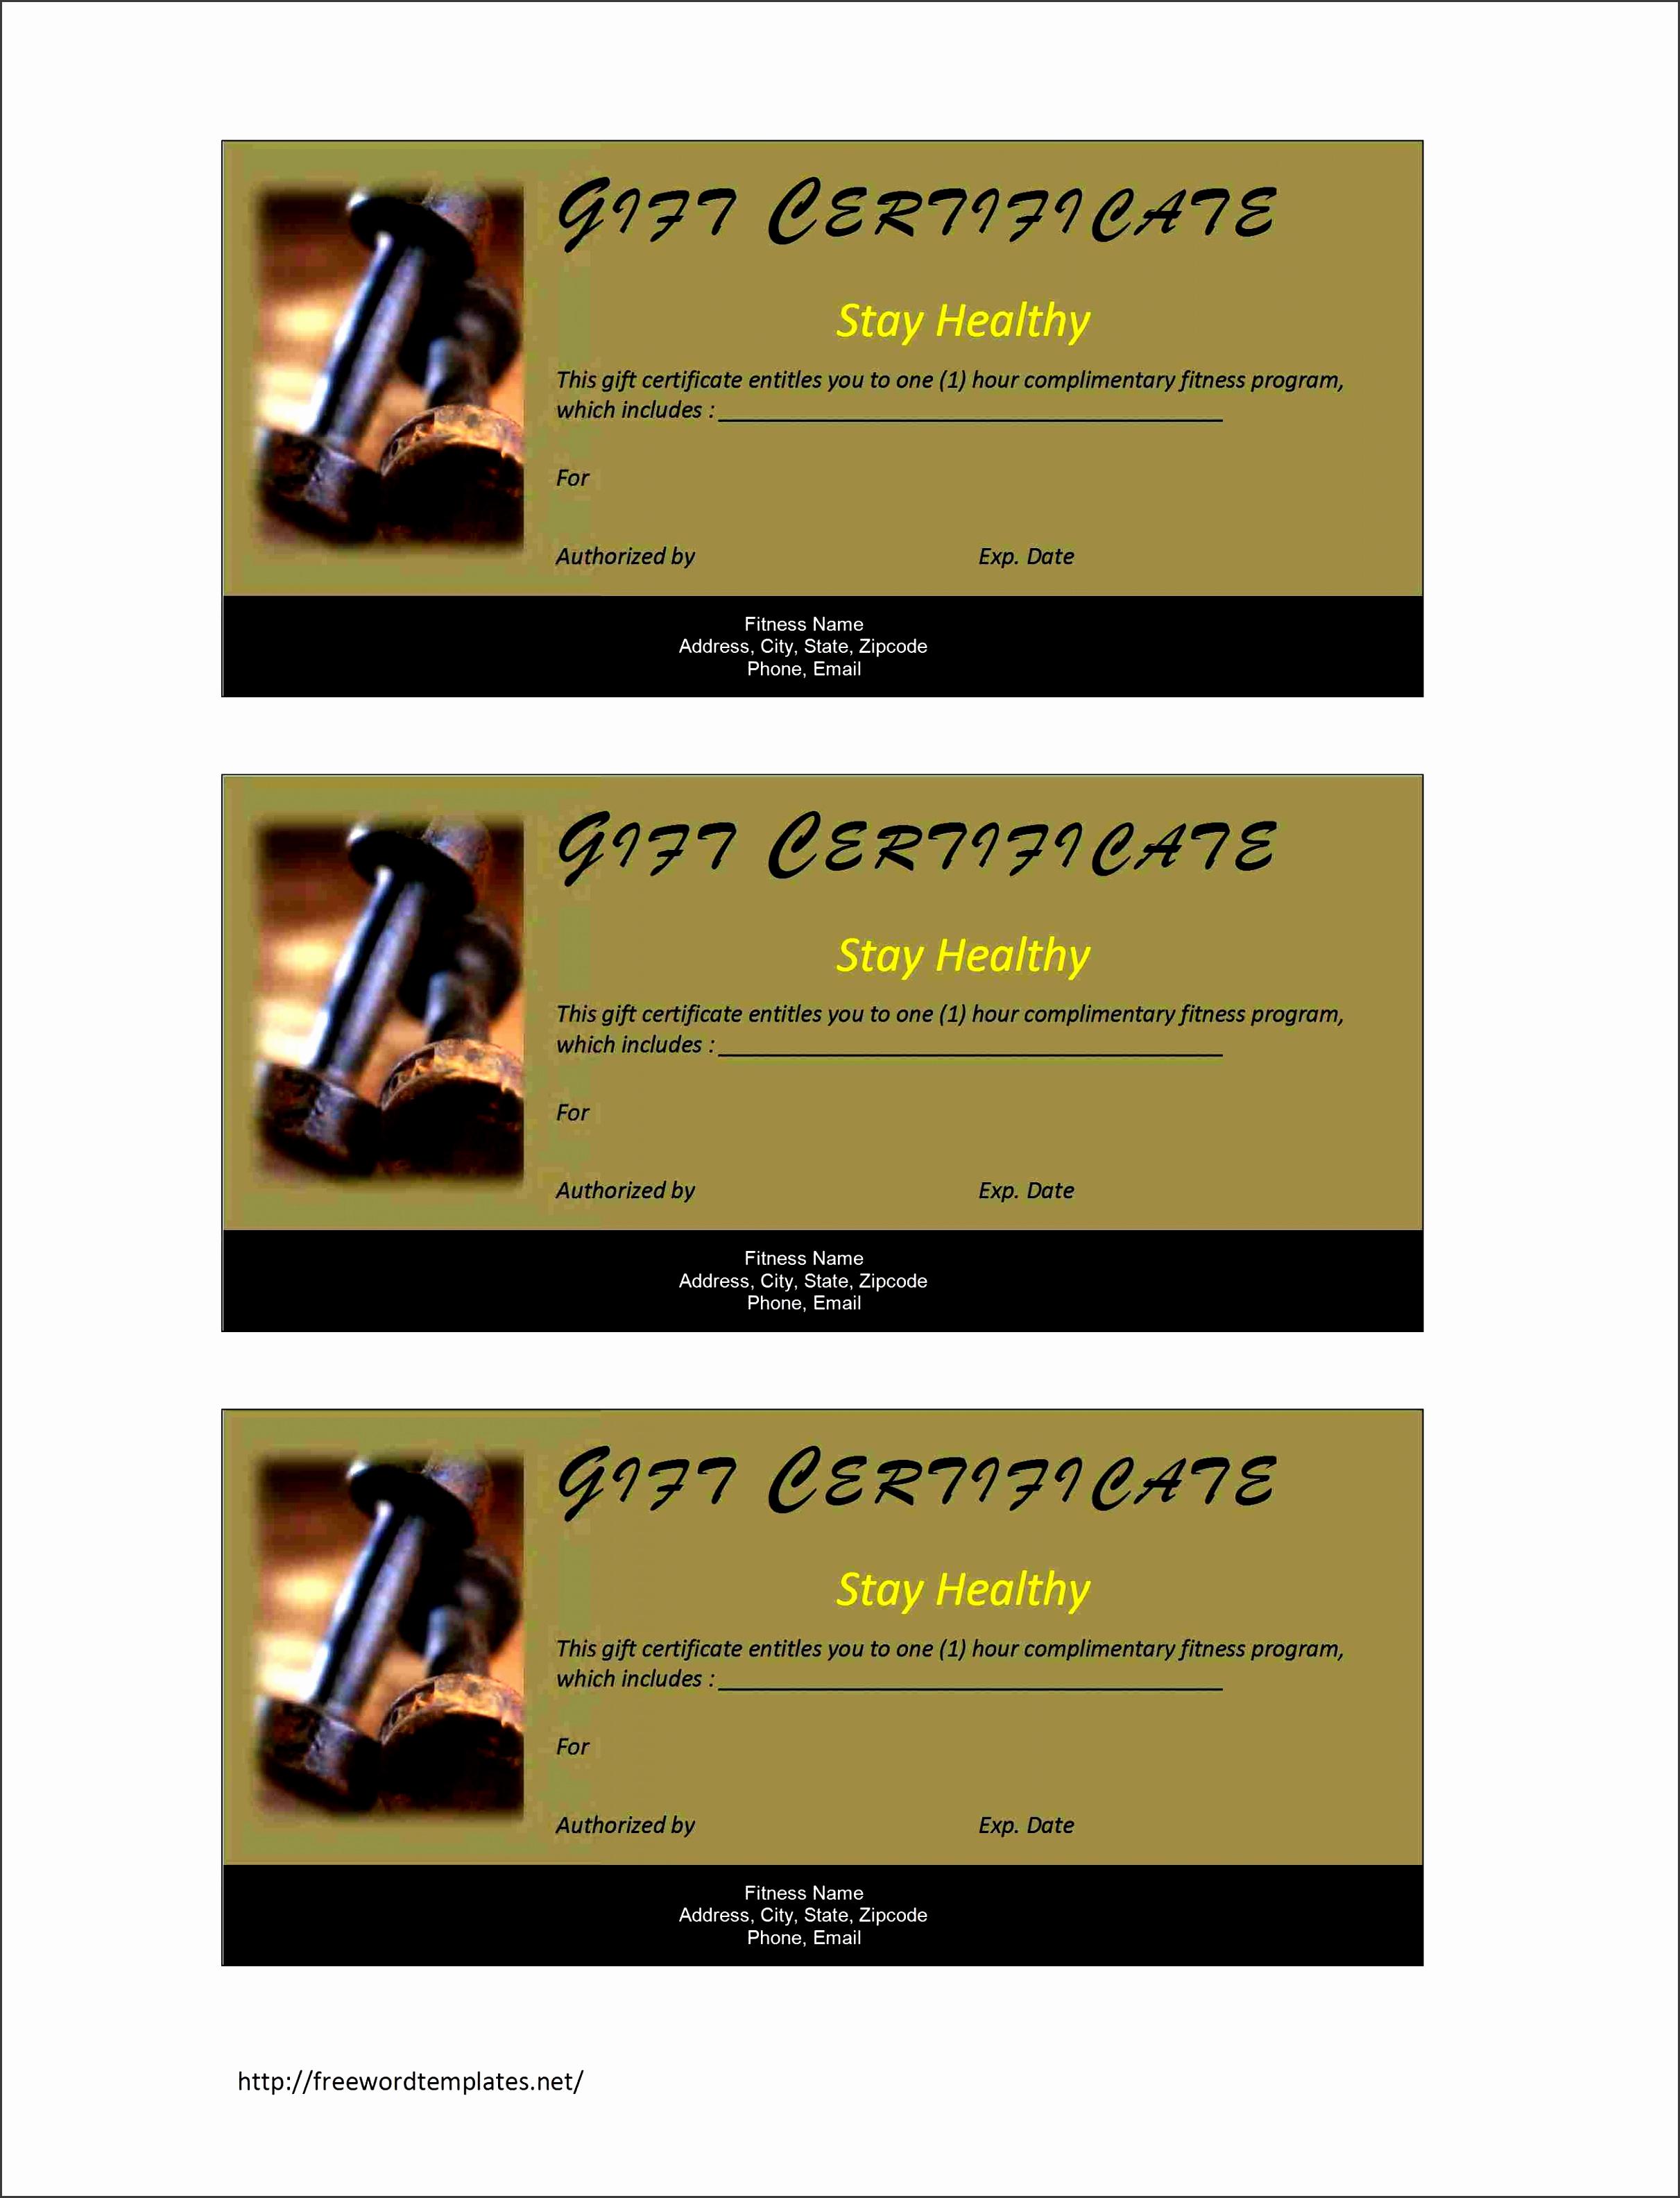 Restaurant Gift Certificate Template Inspirational 9 Restaurant Voucher Template Sampletemplatess